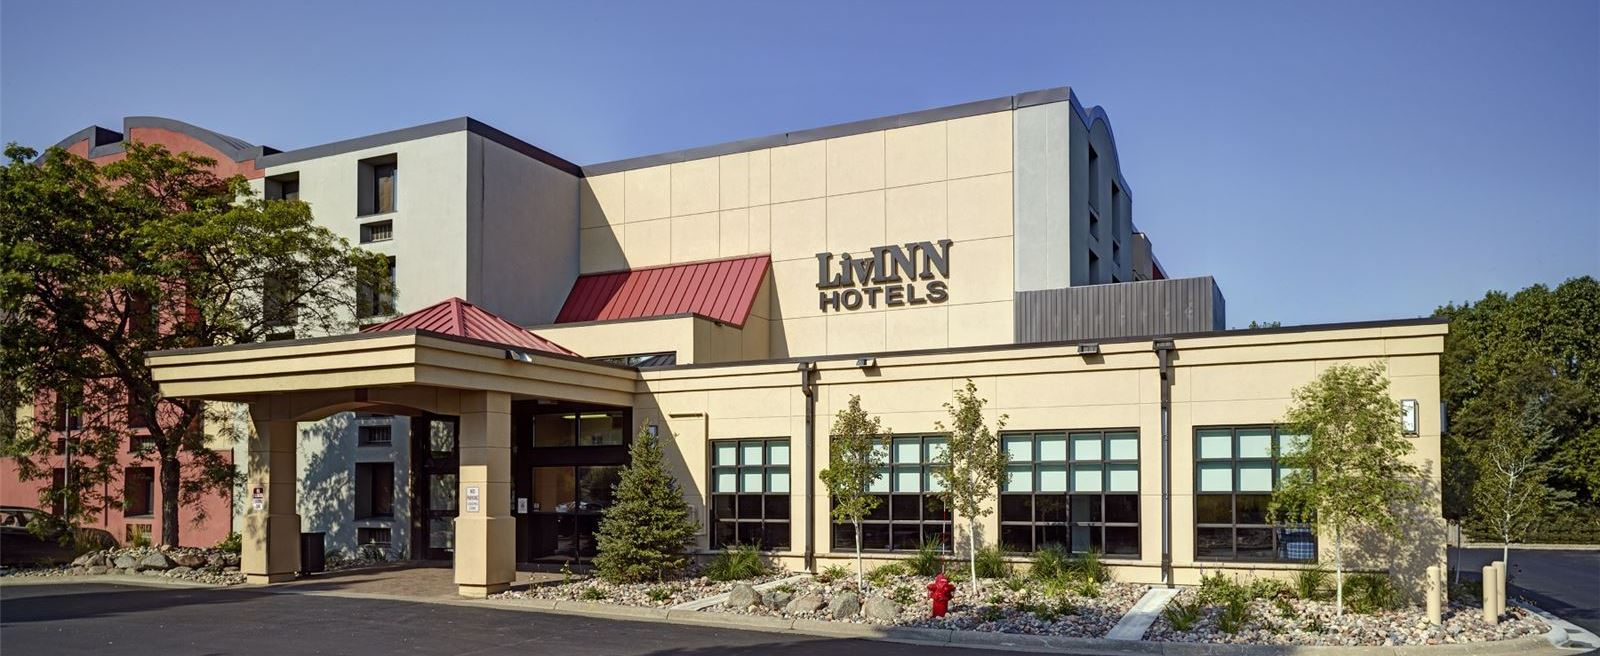 About LivINN Hotels, Minneapolis